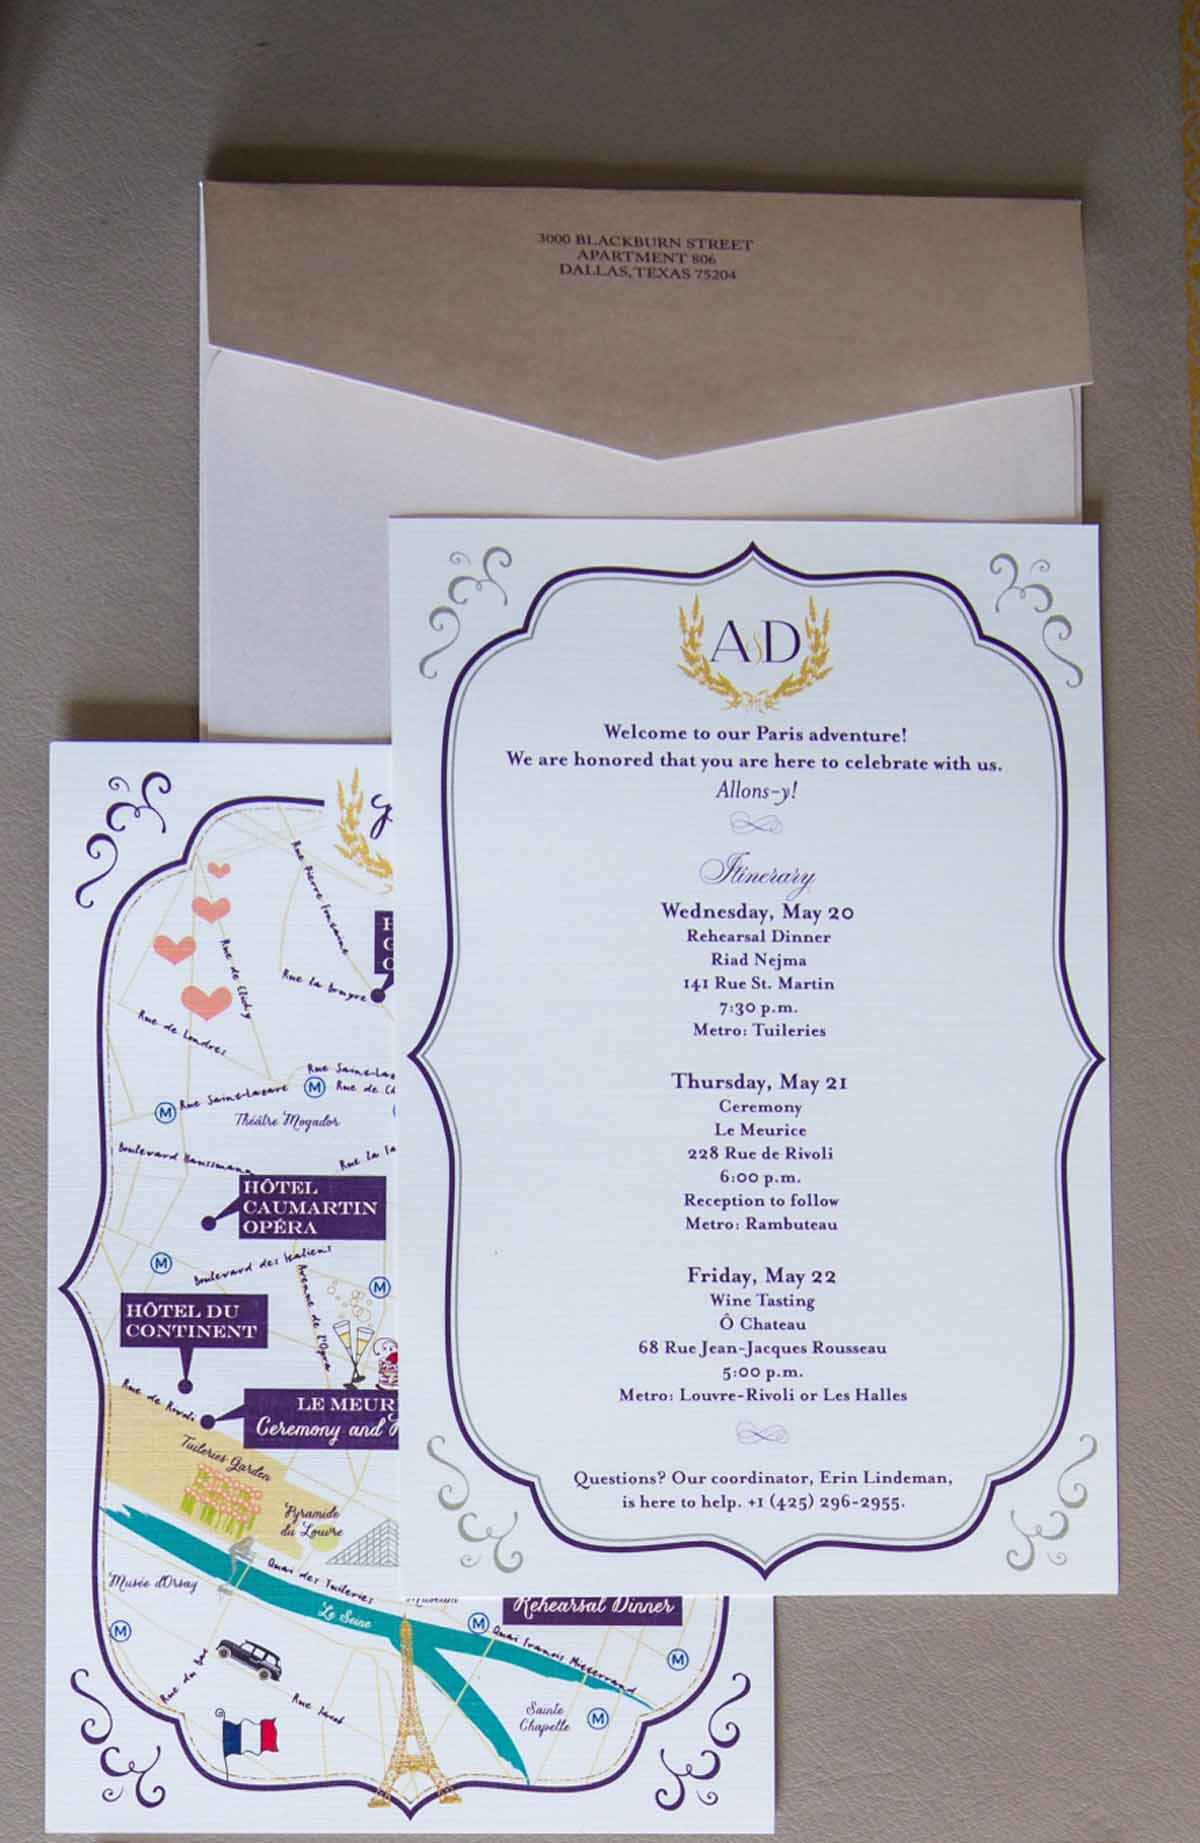 Custom Wedding Map Map and Itinerary Wedding Weekend Timeline Map Illustration Wedding Map Invitation Destination Wedding